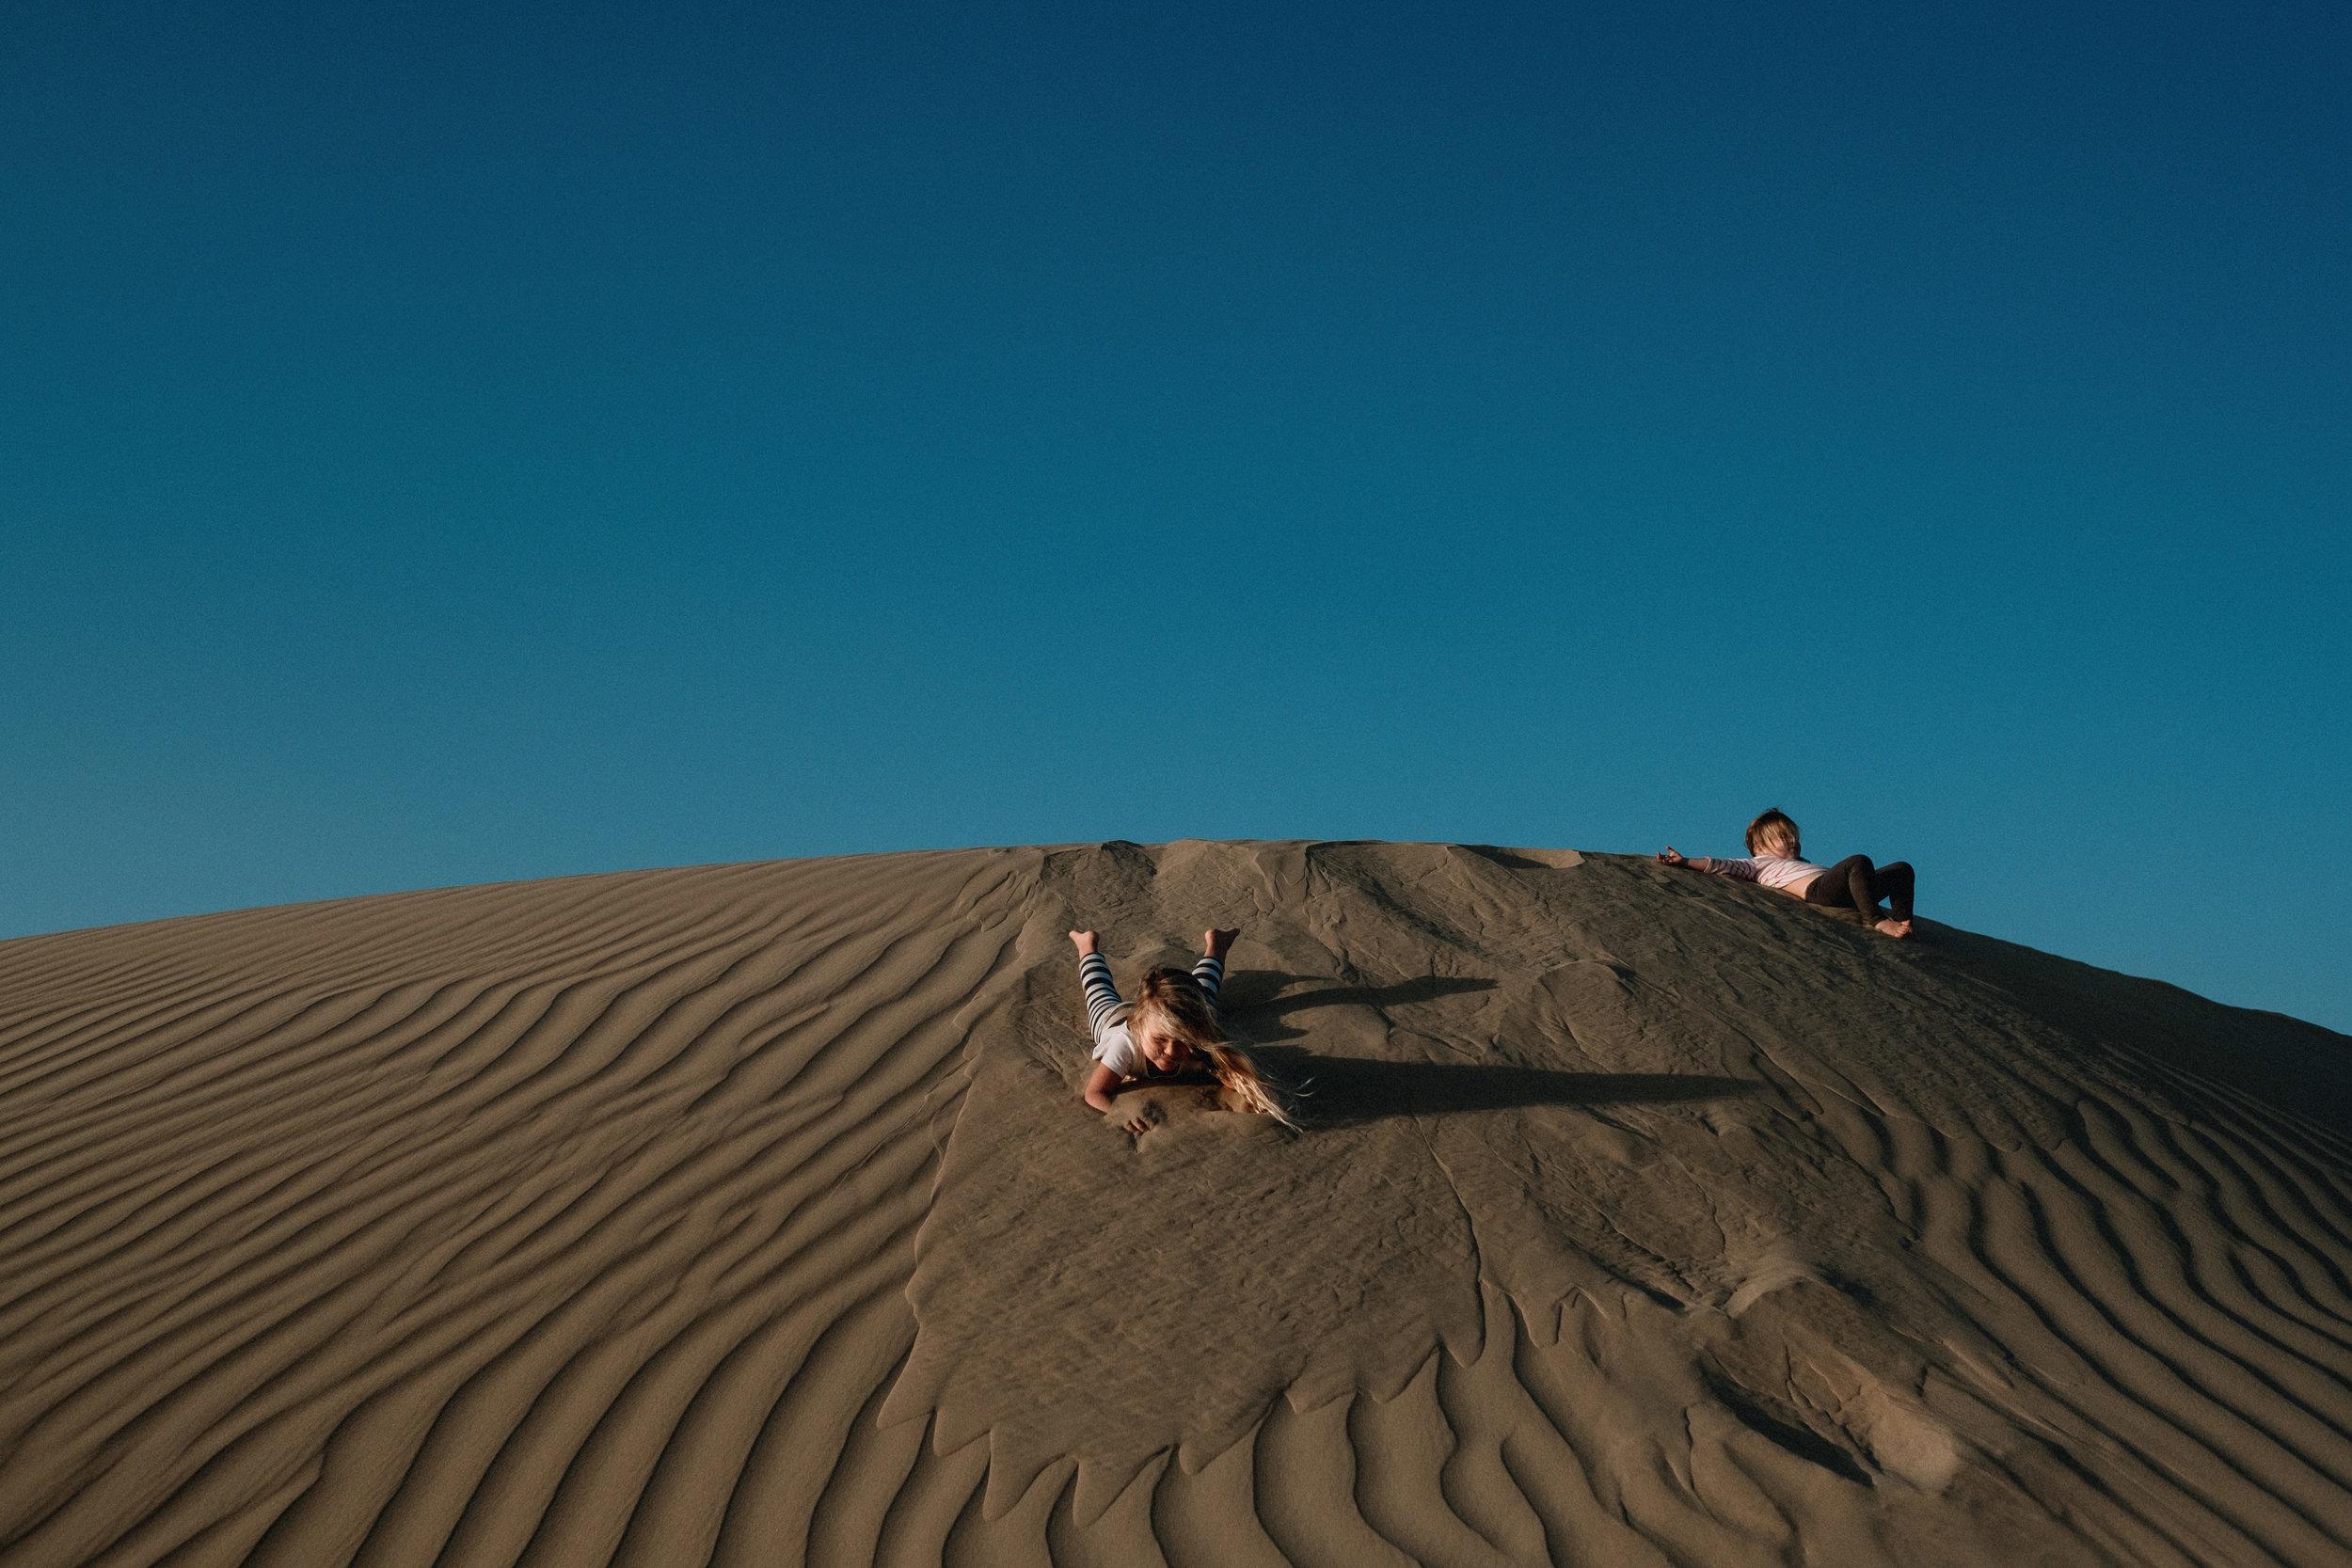 Three young girls slide down sand dune